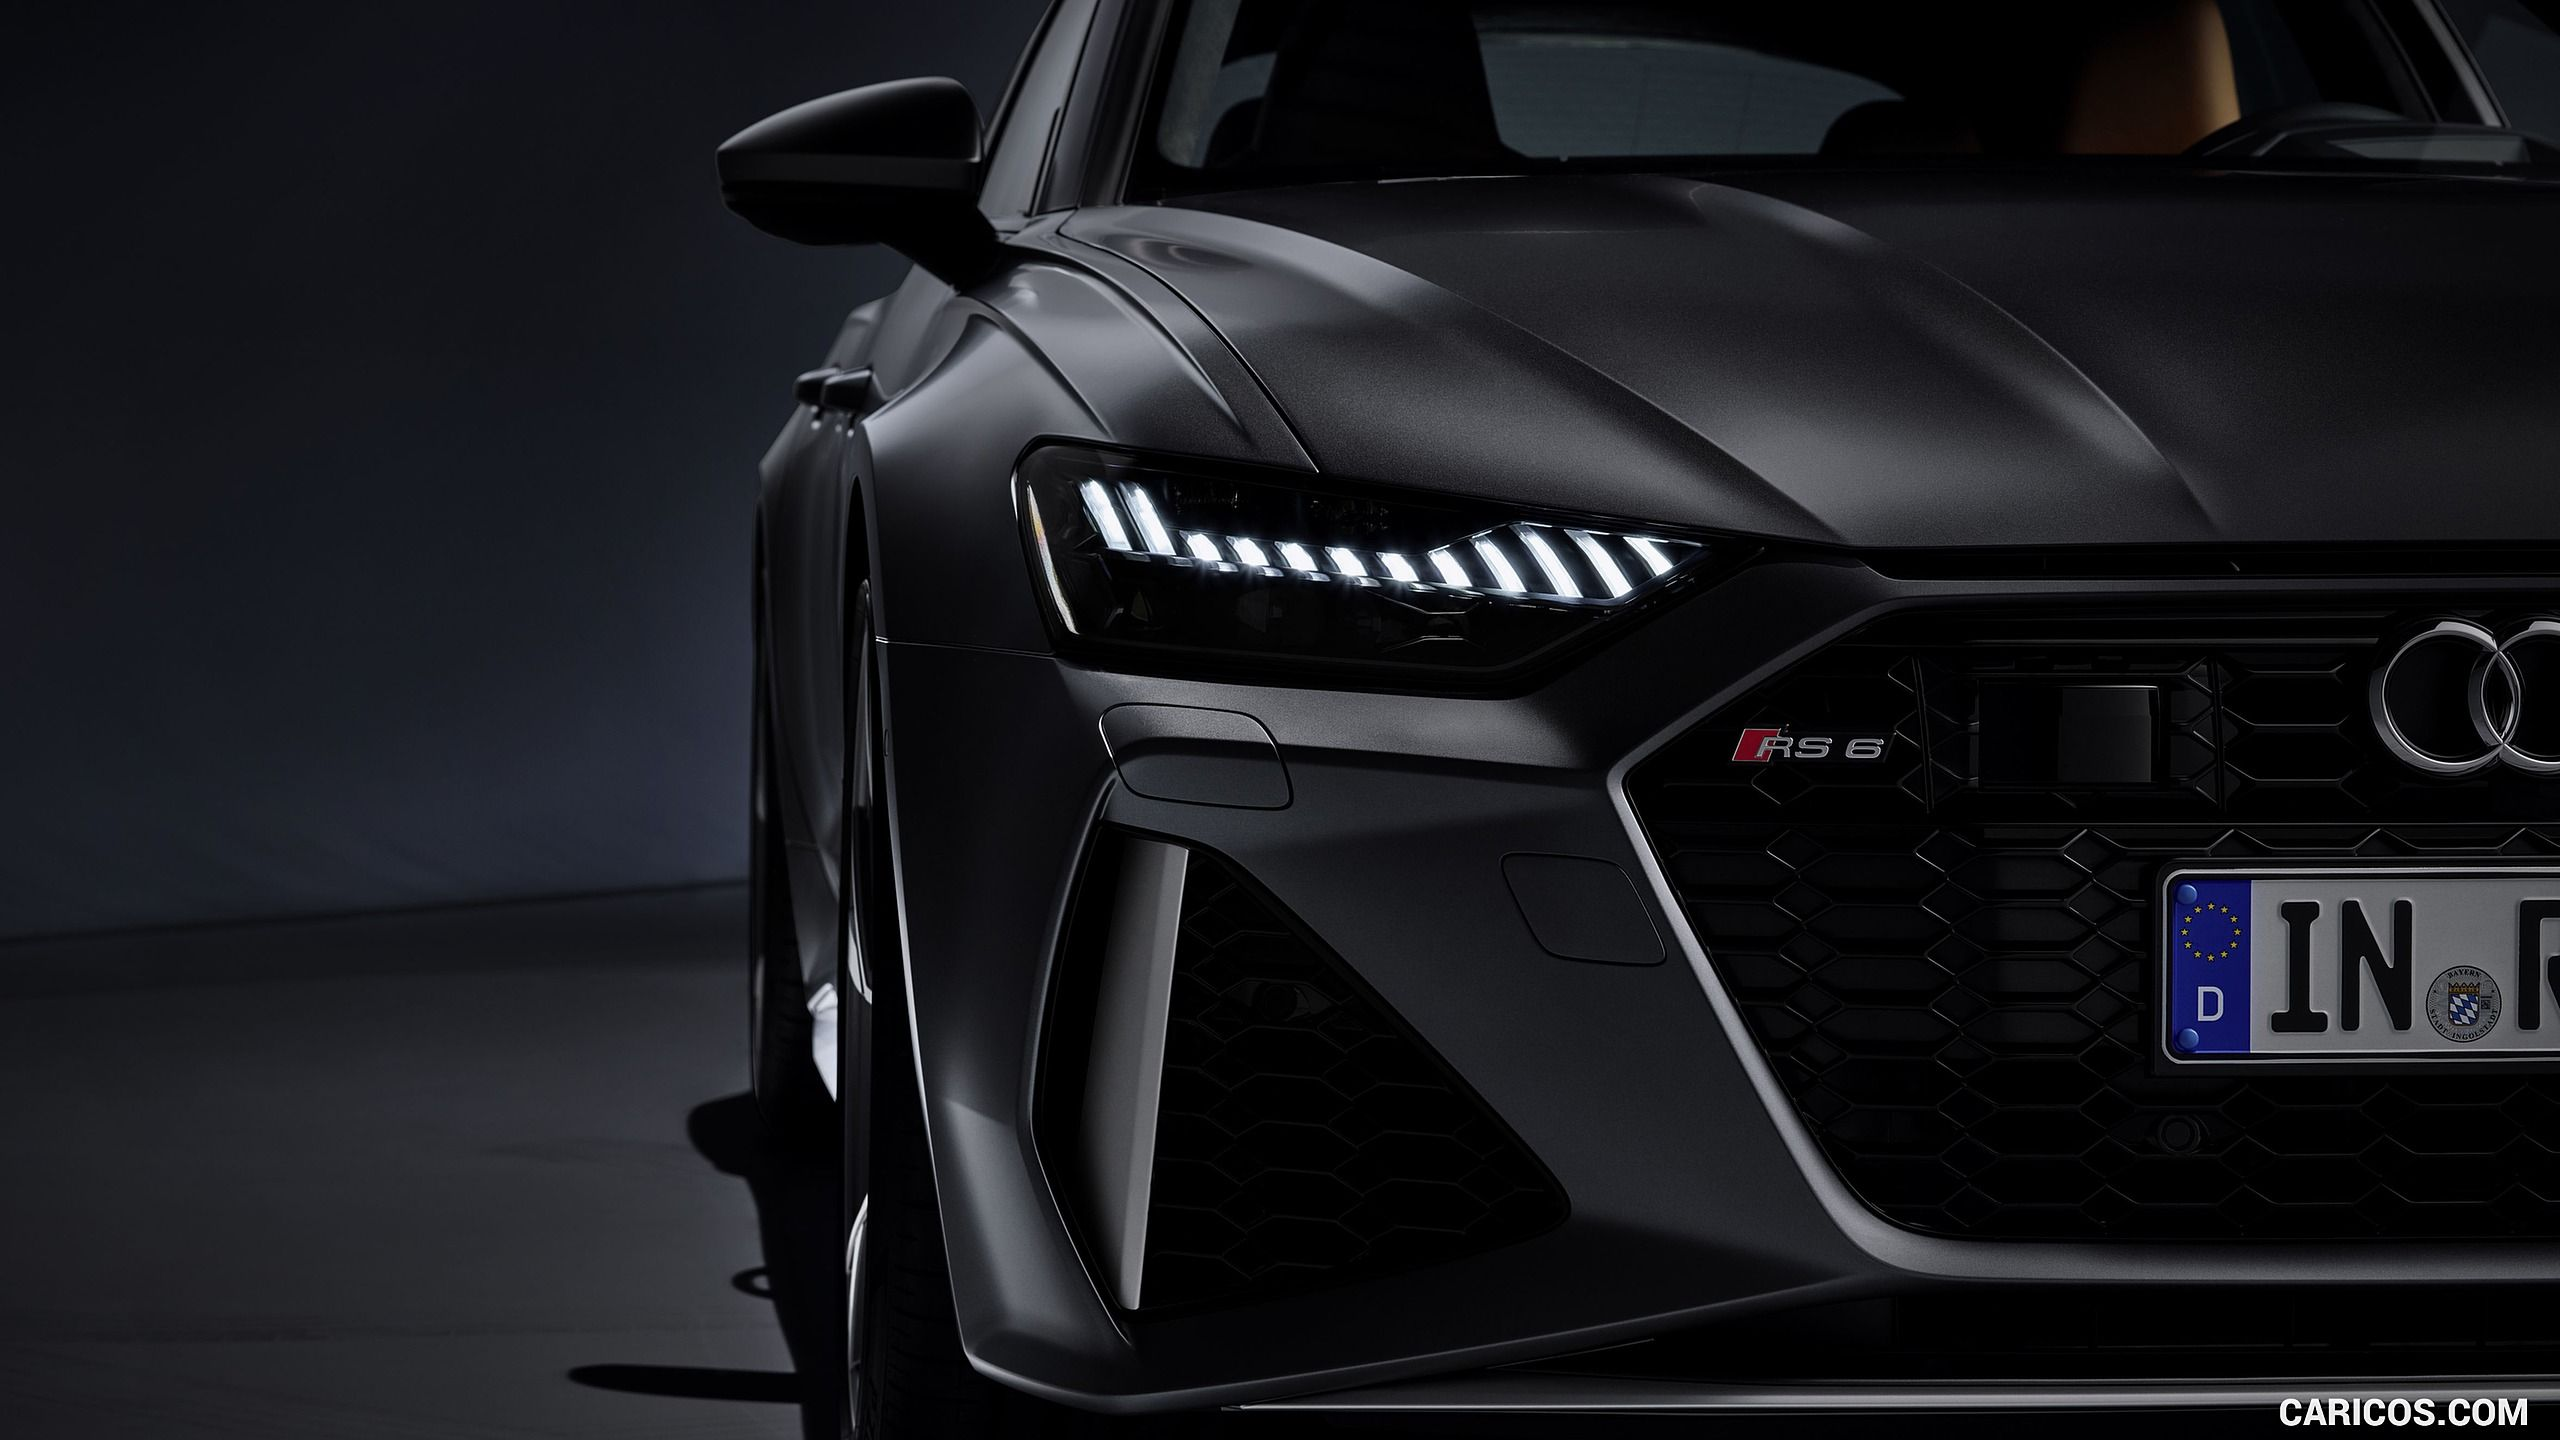 2020 Audi Rs 6 Avant Audi Rs Audi Rs6 Audi